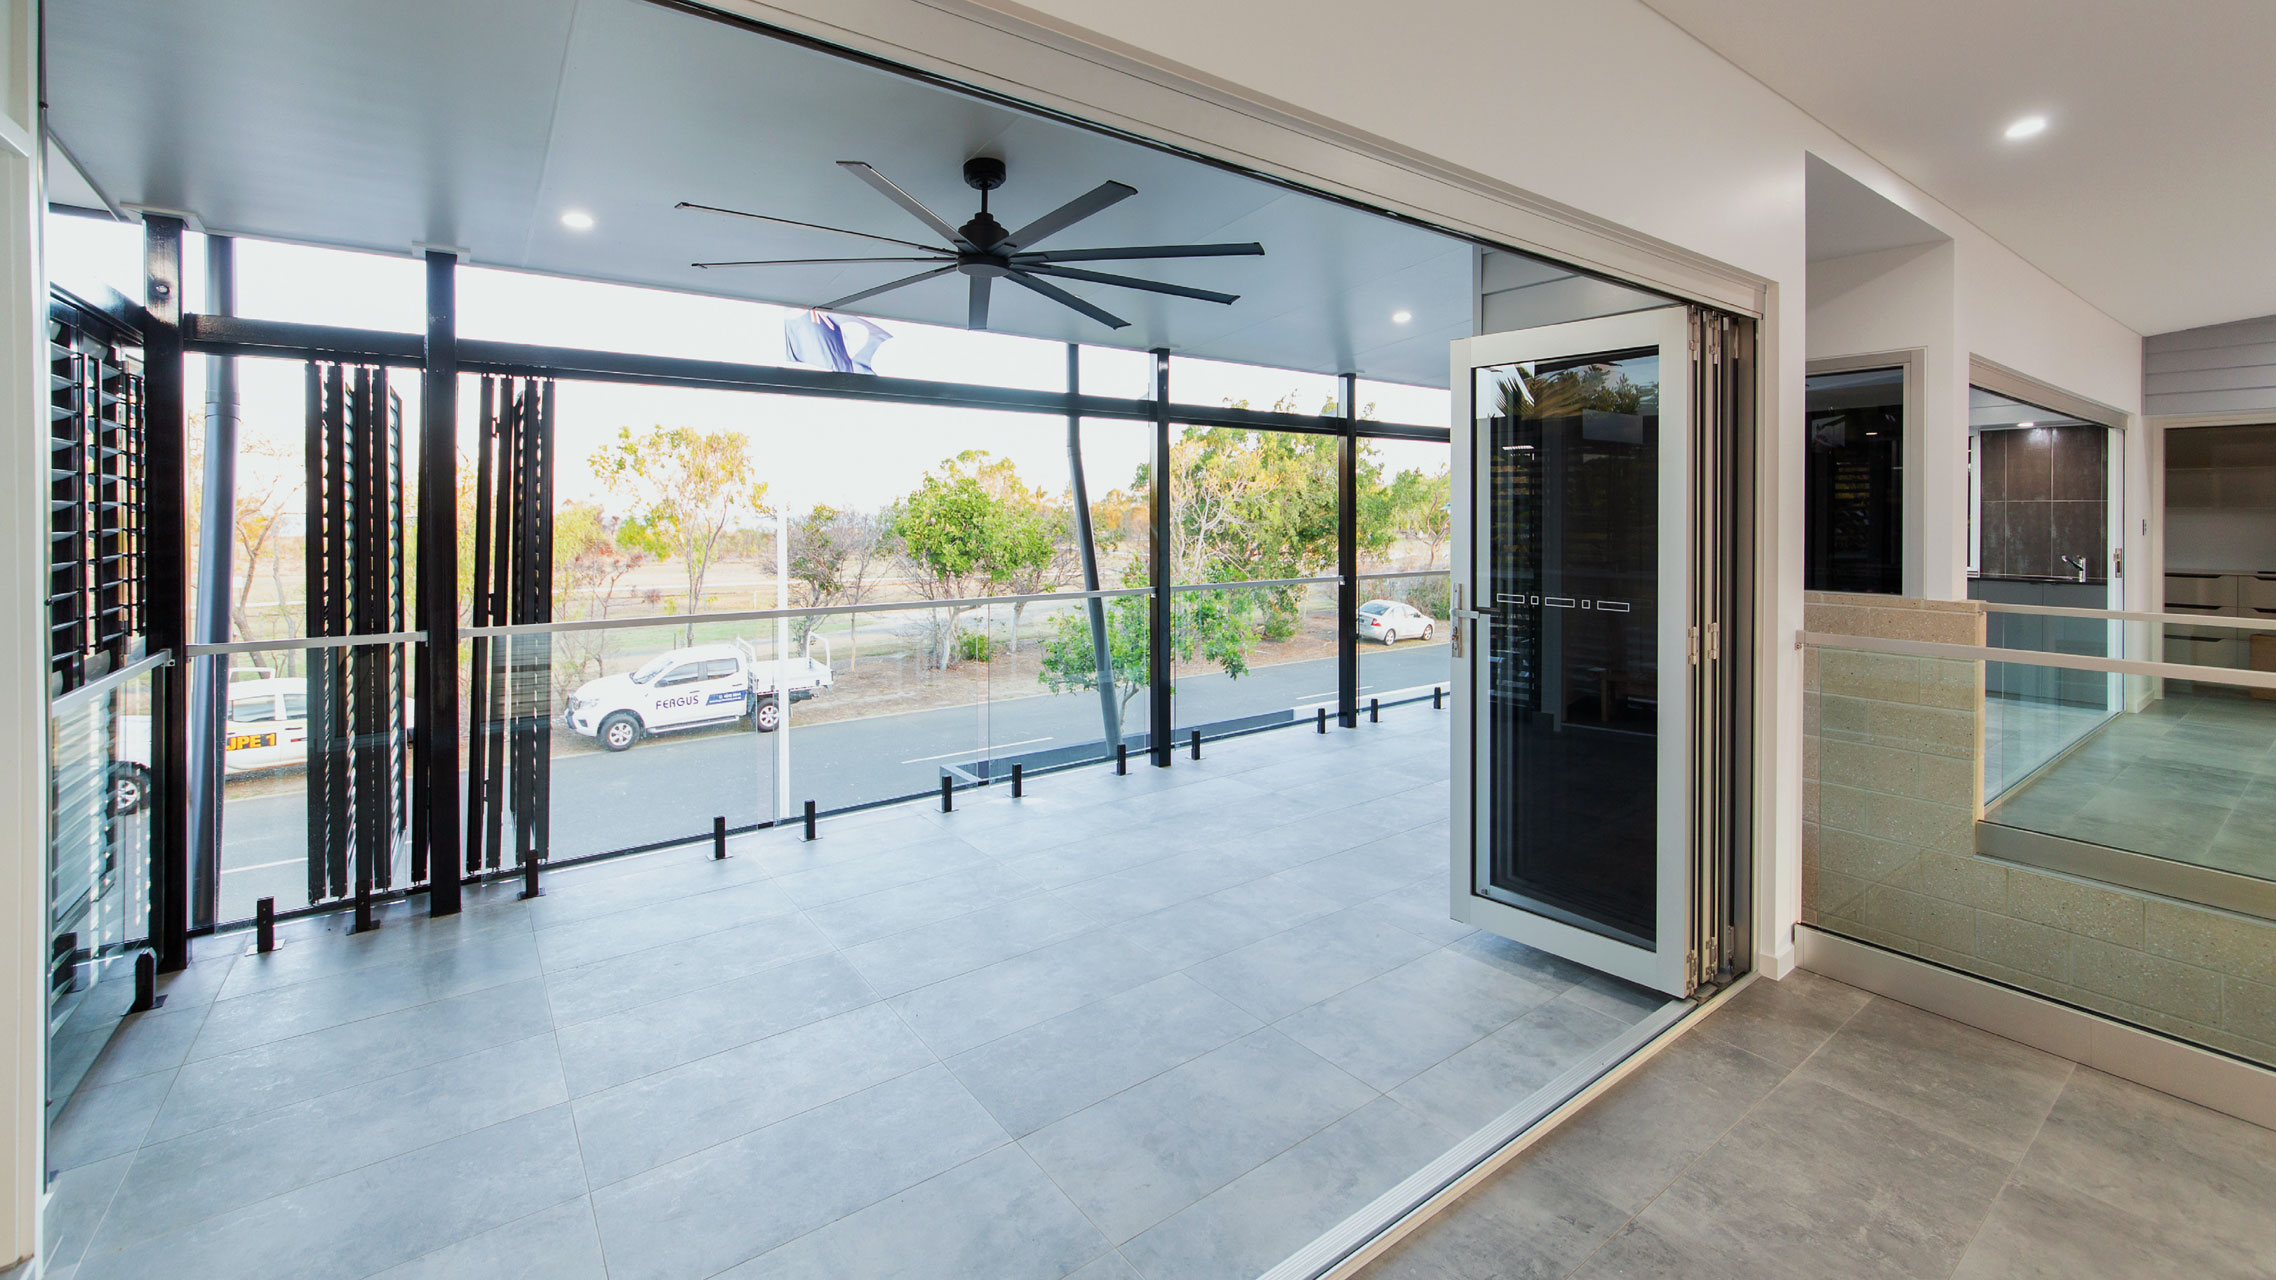 Aluminium Bifold Doors with grey glass opening to a balcony